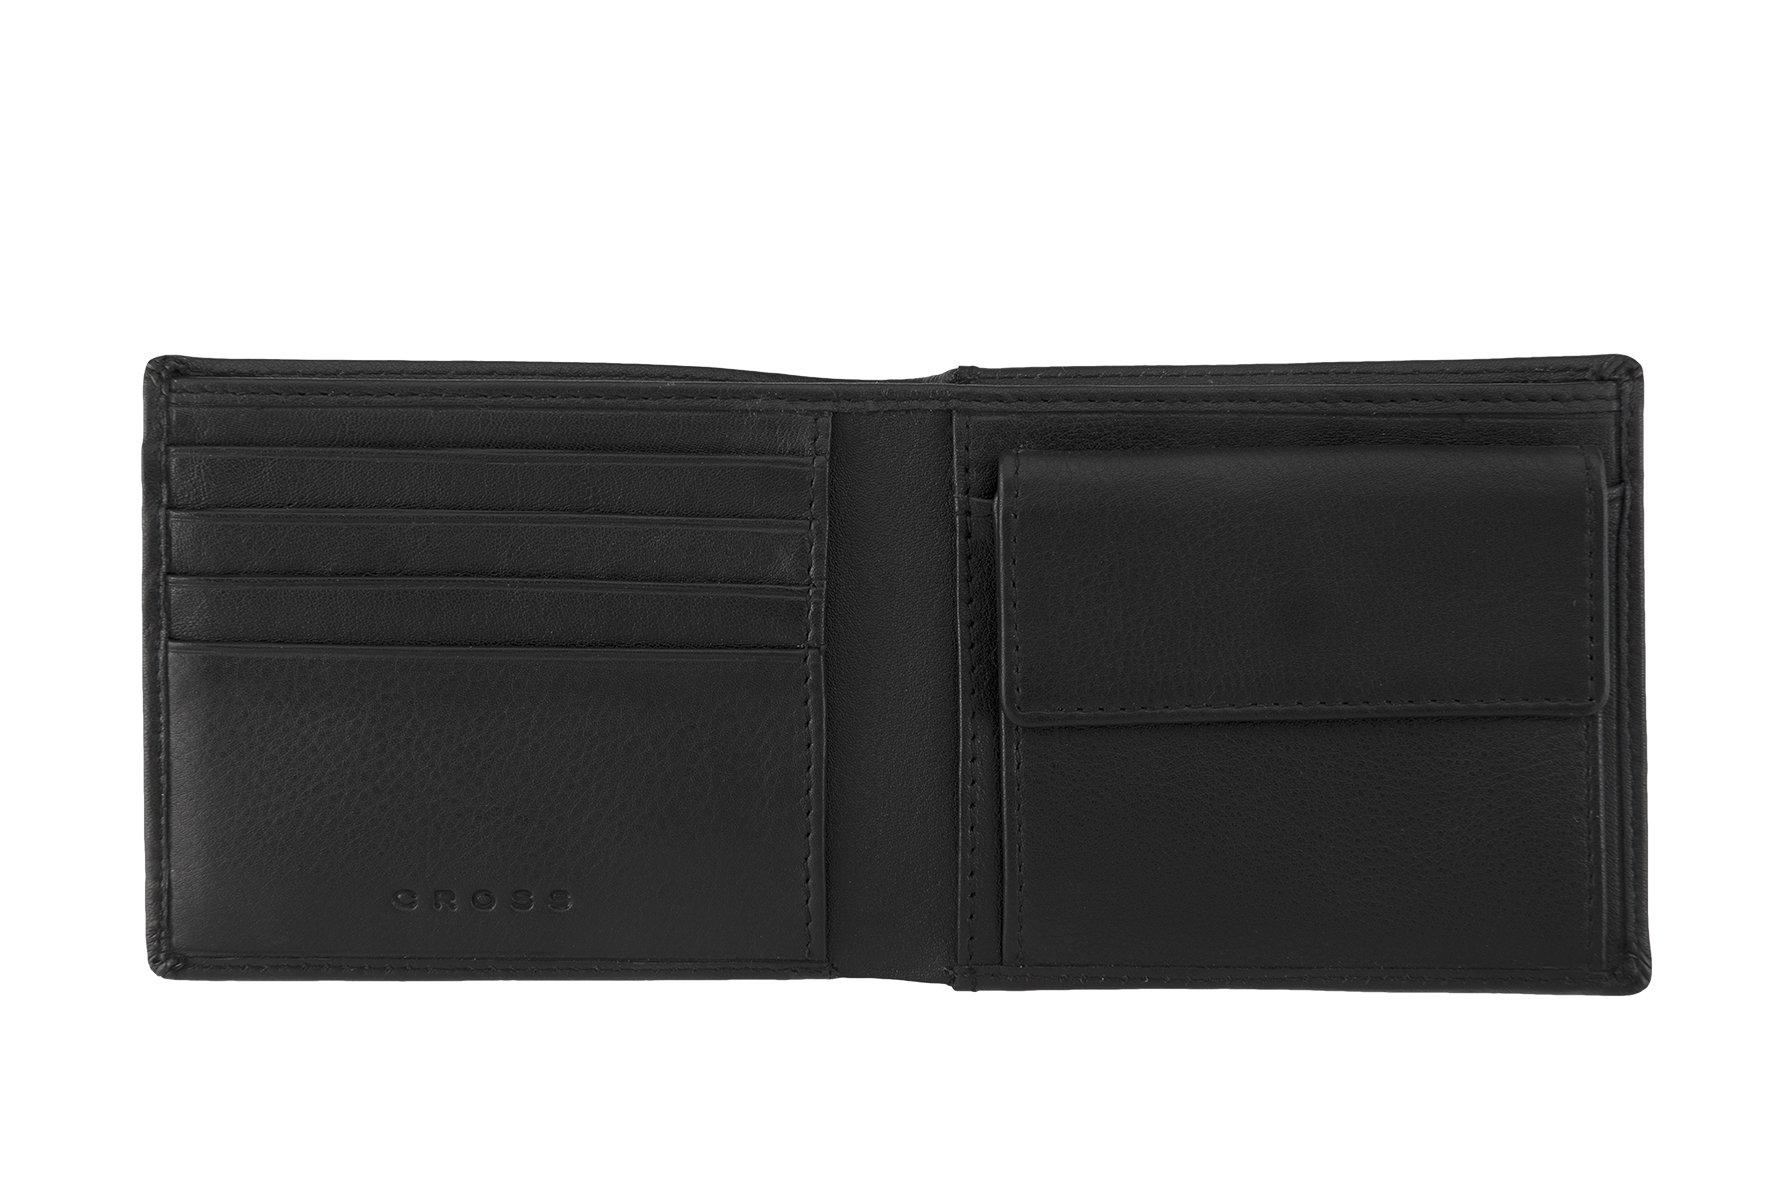 COSTA RICA Dárková sada peněženky a pouzdra na kreditky CROSS - černá kůže  ... ff91e64cf6